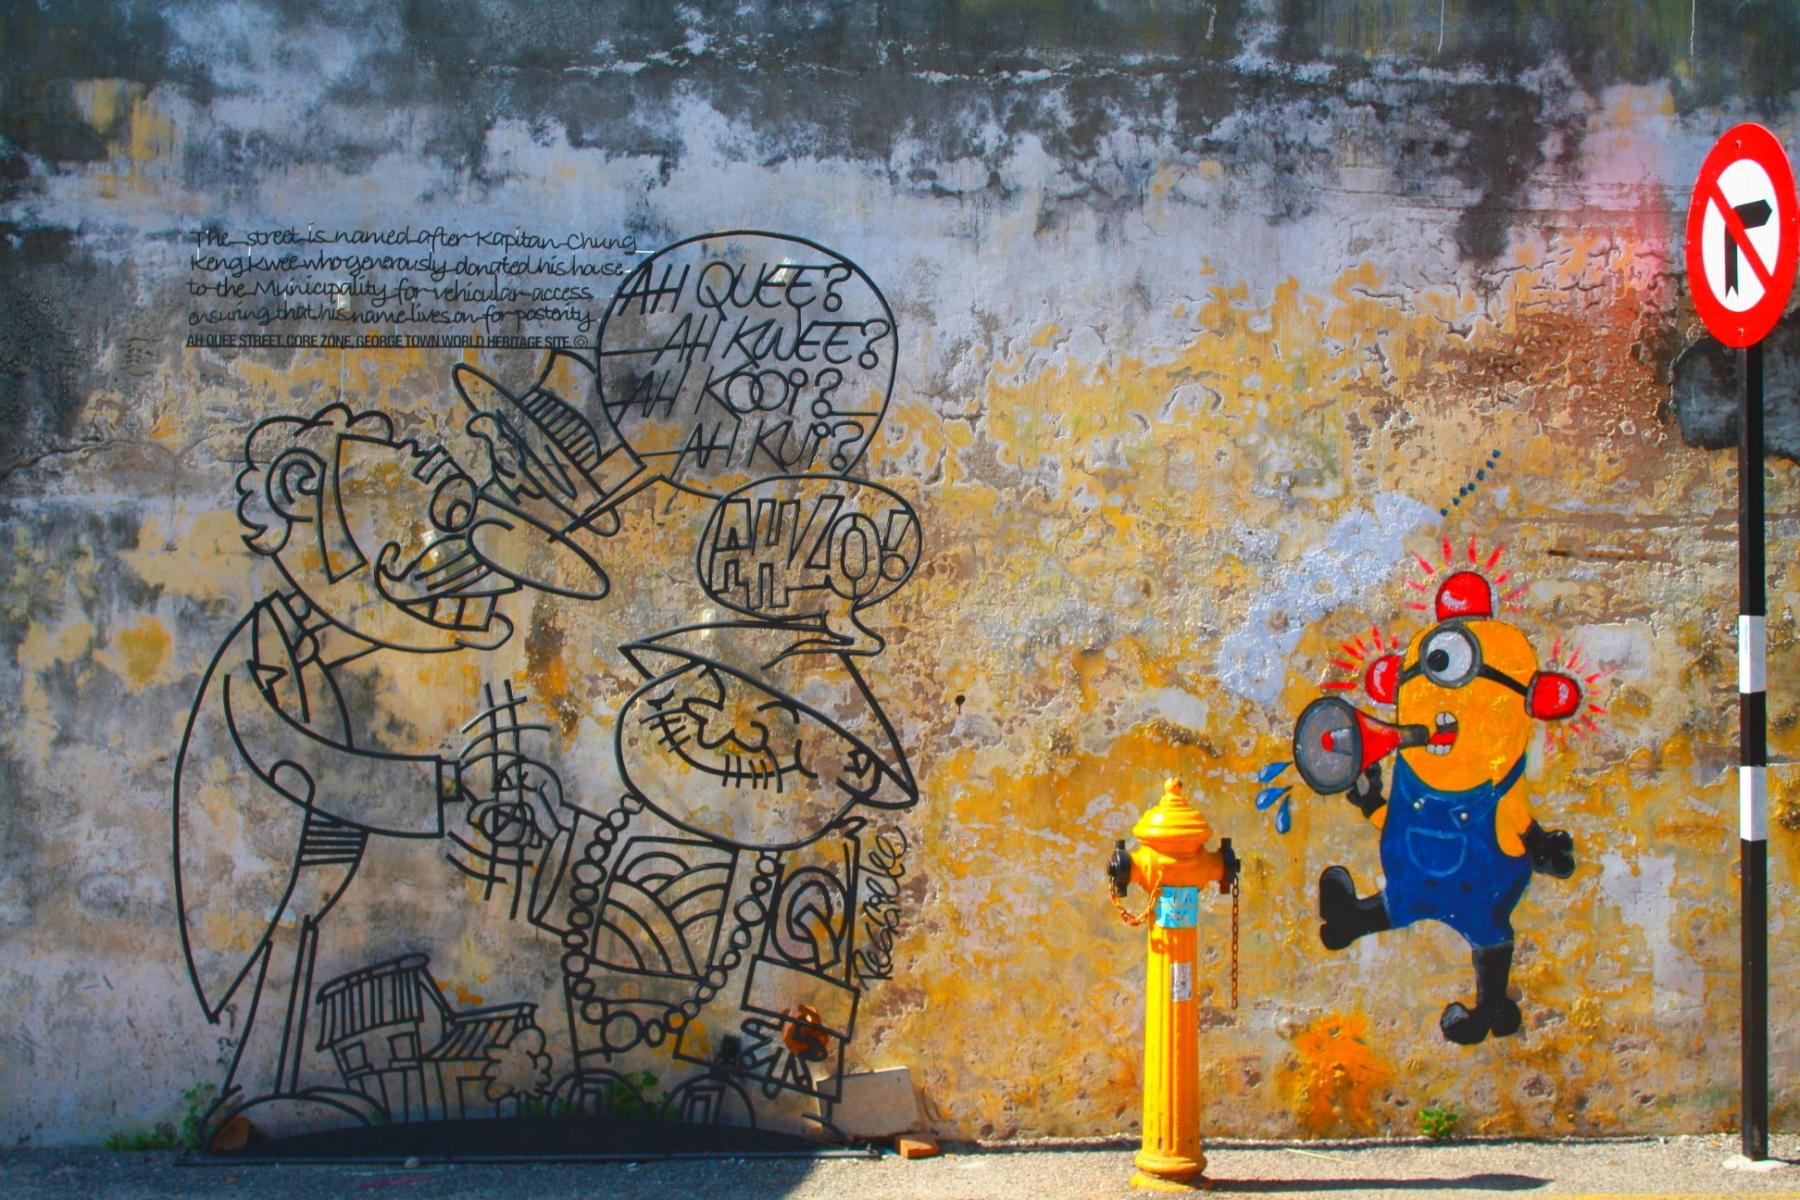 Ah_Kwee_street_art_Georgetown_Penang_Malaysia